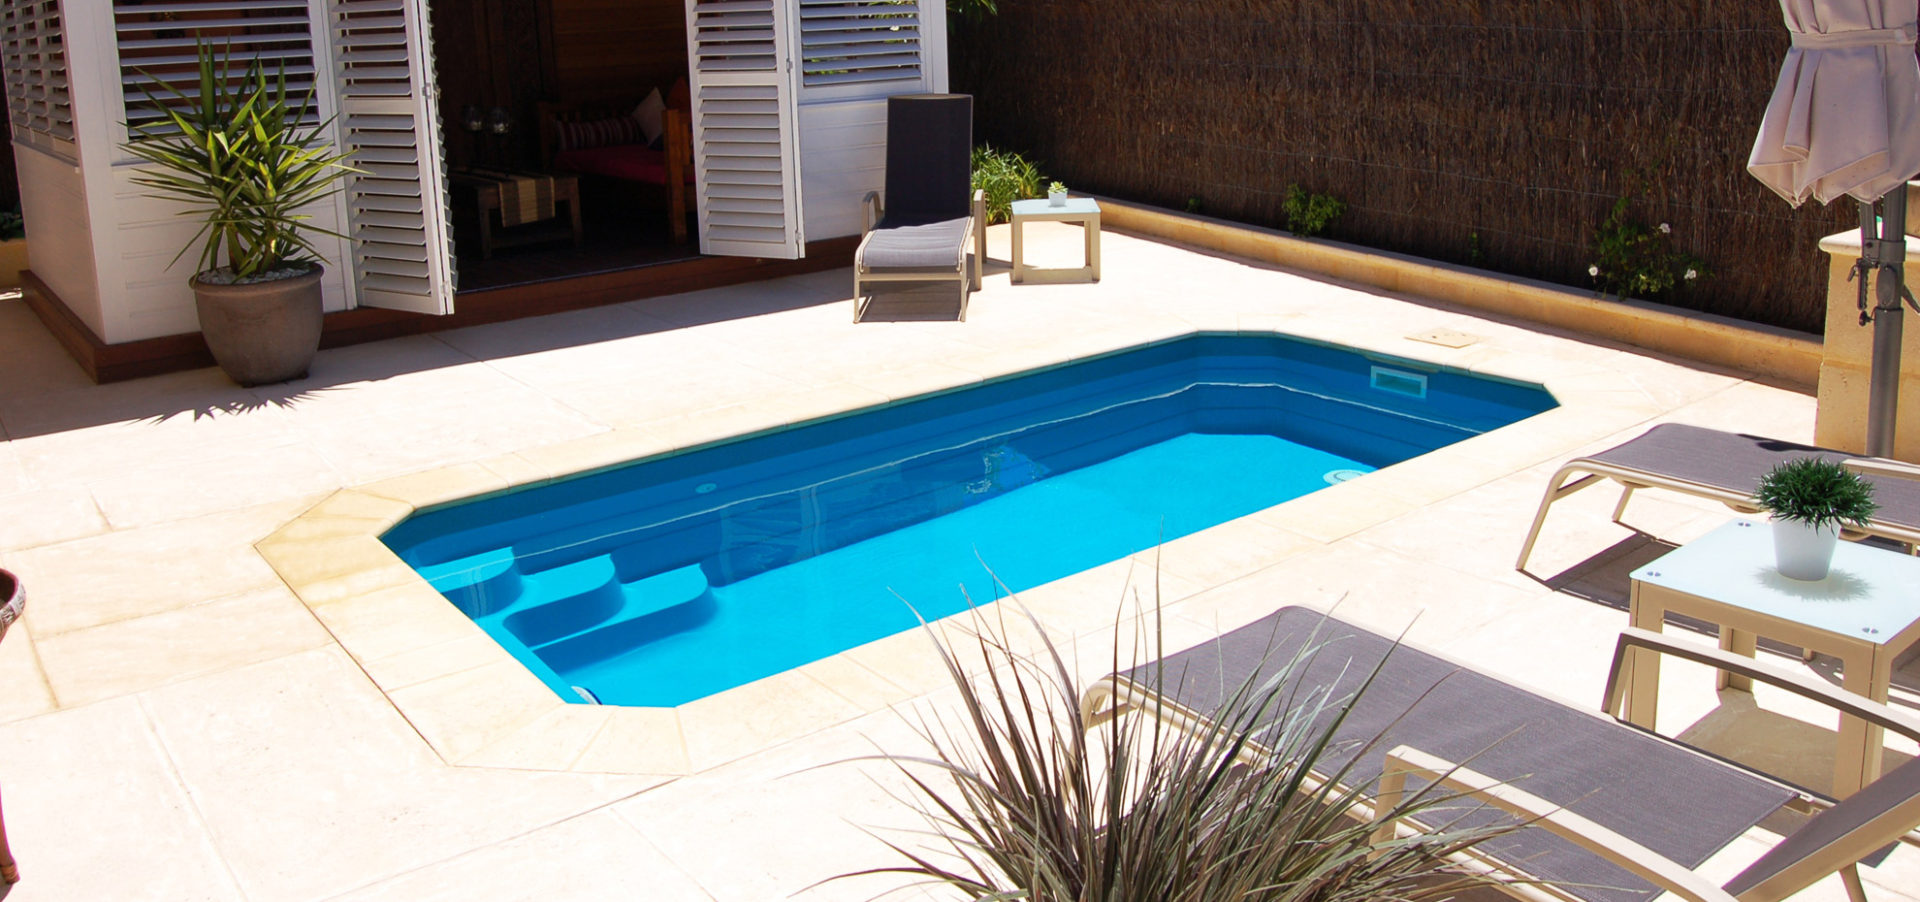 Leisure pools la piscine coque olympus un mod le for Piscine leisure pools